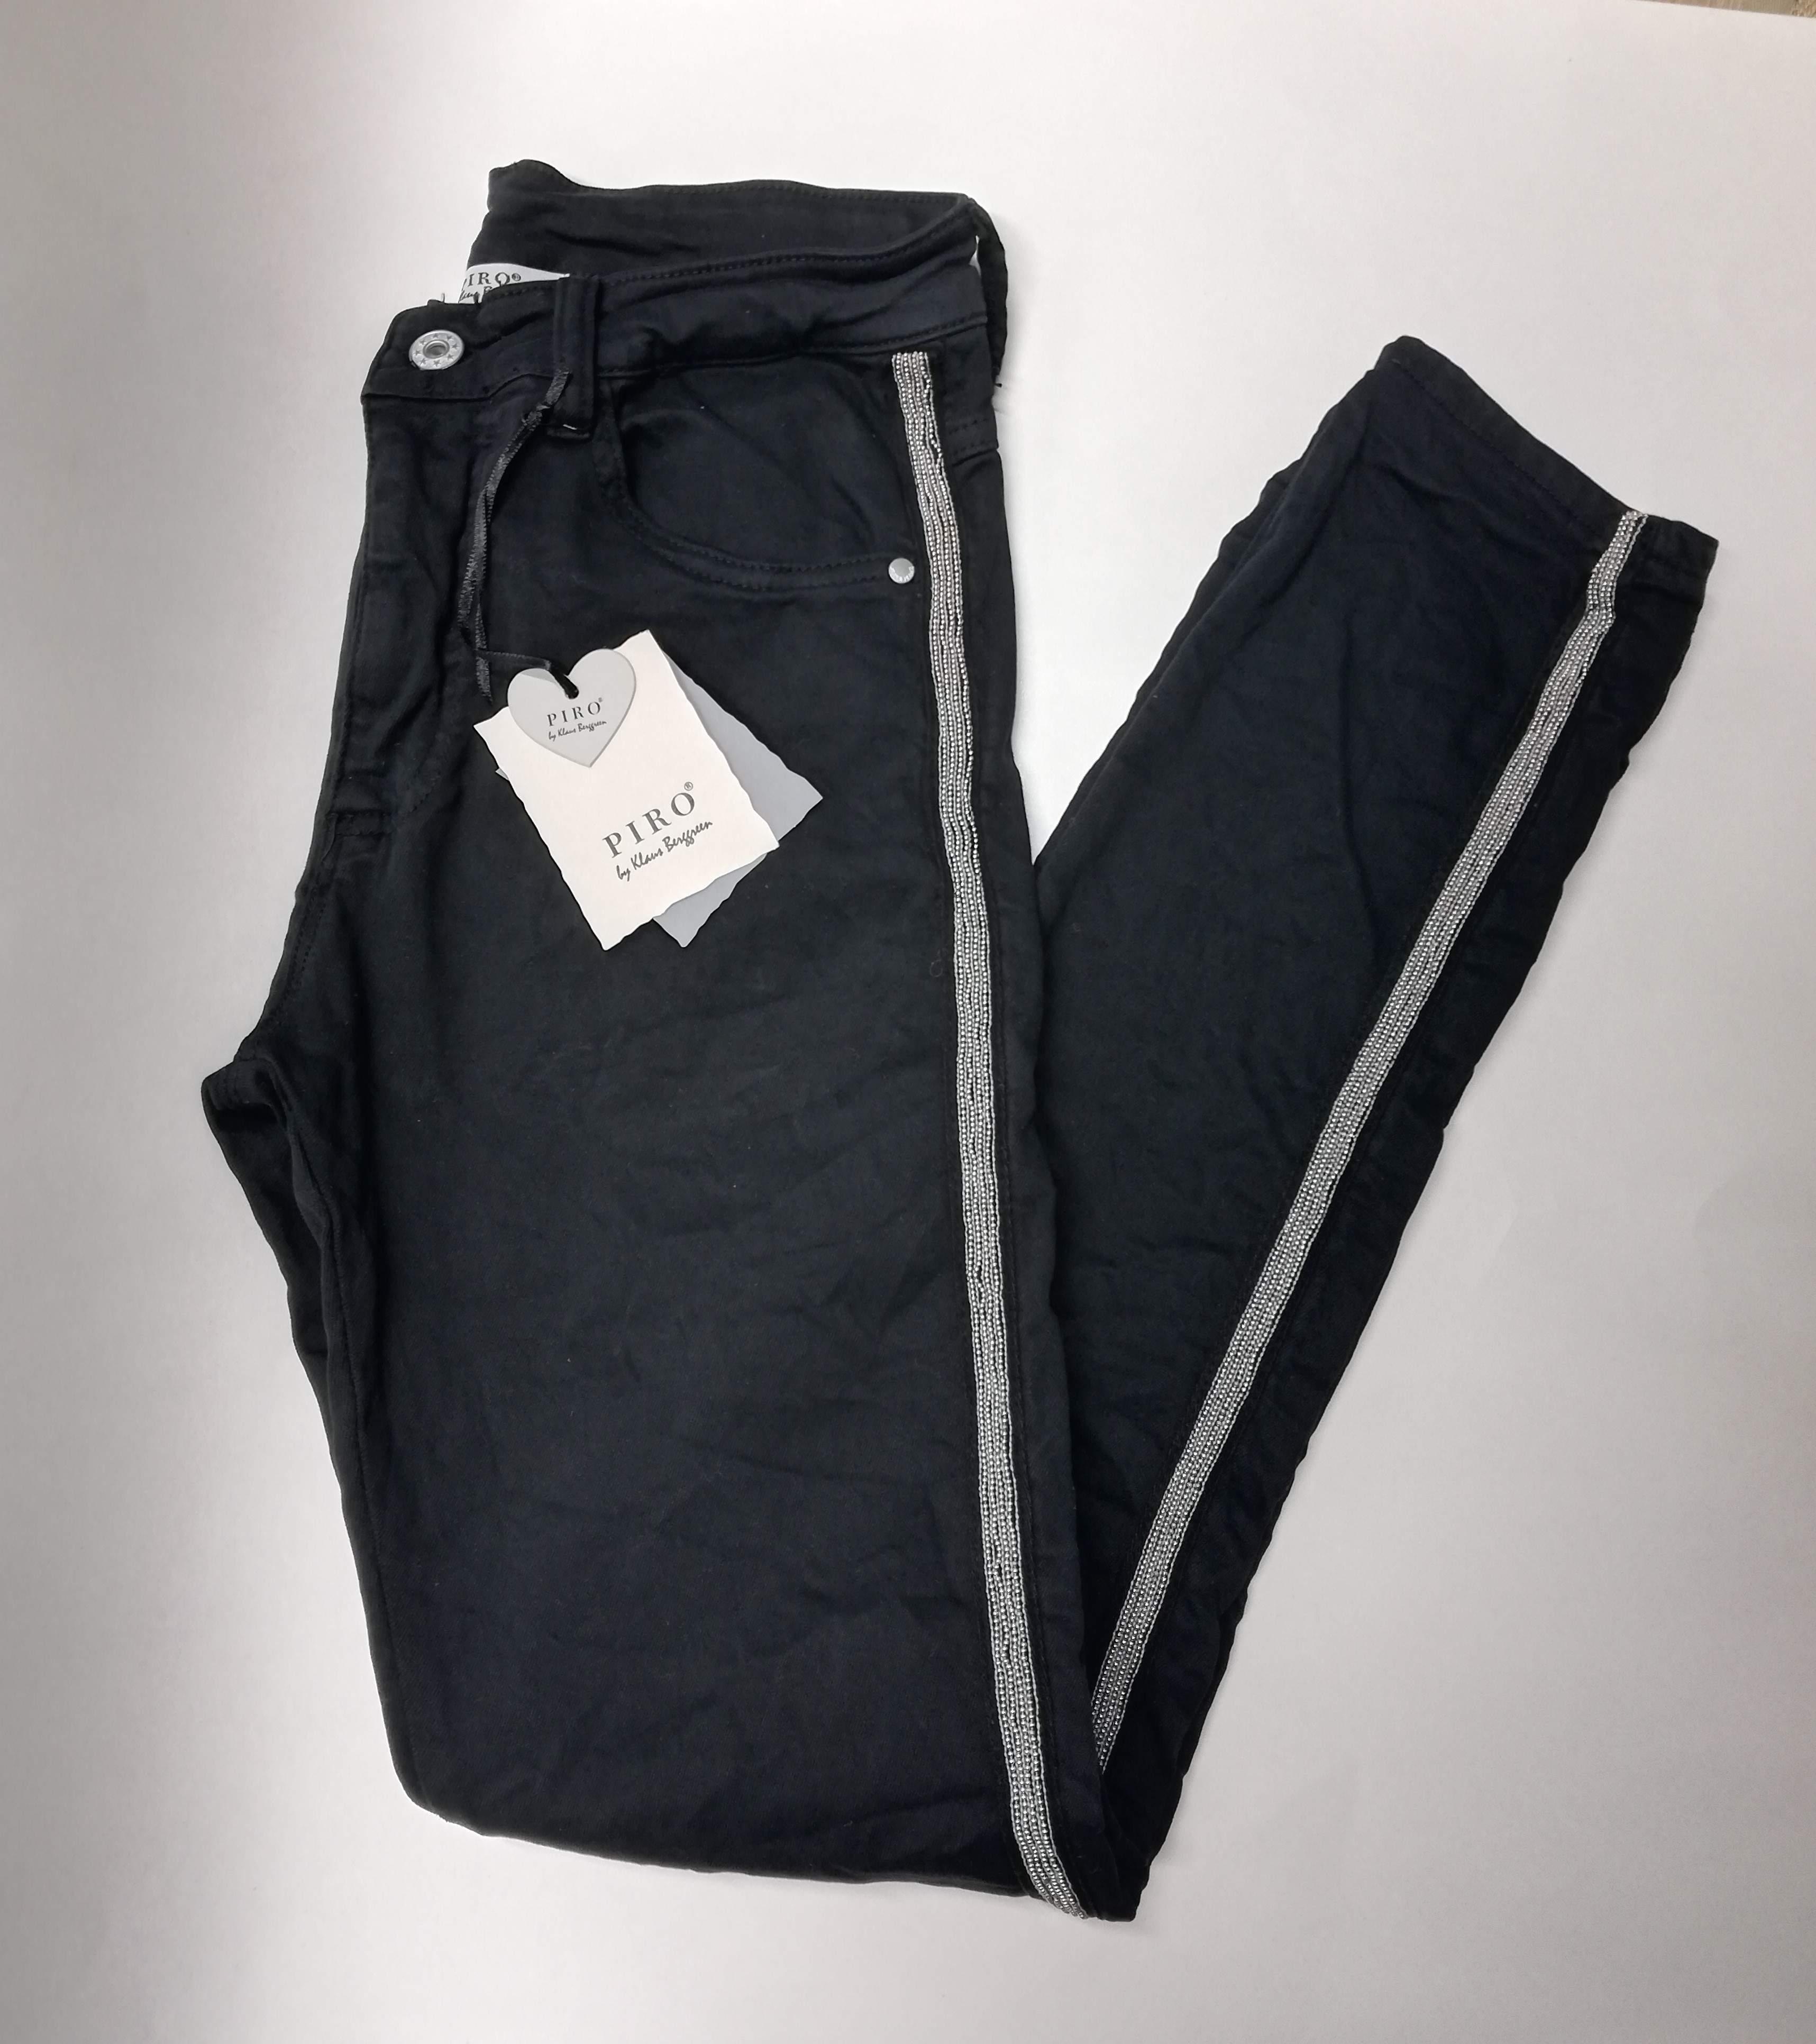 Piro Jeans Naisten Farkut, Silver Stripe Musta